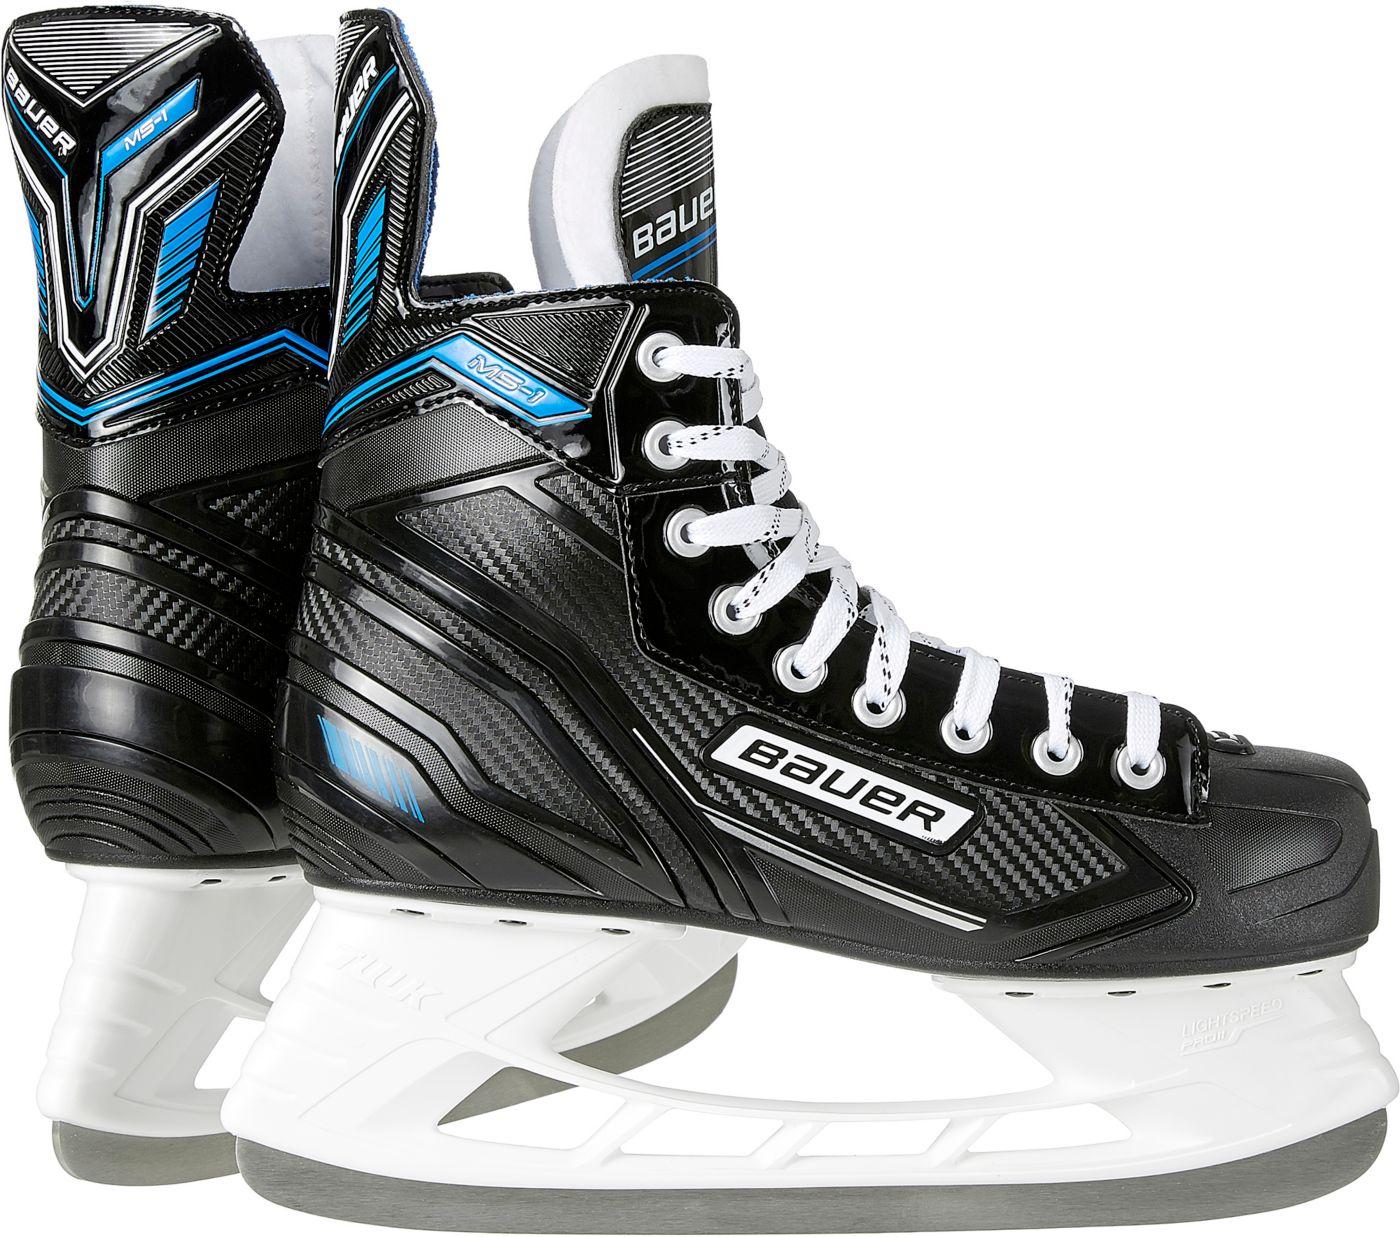 Bauer Youth MS1 Ice Hockey Skates